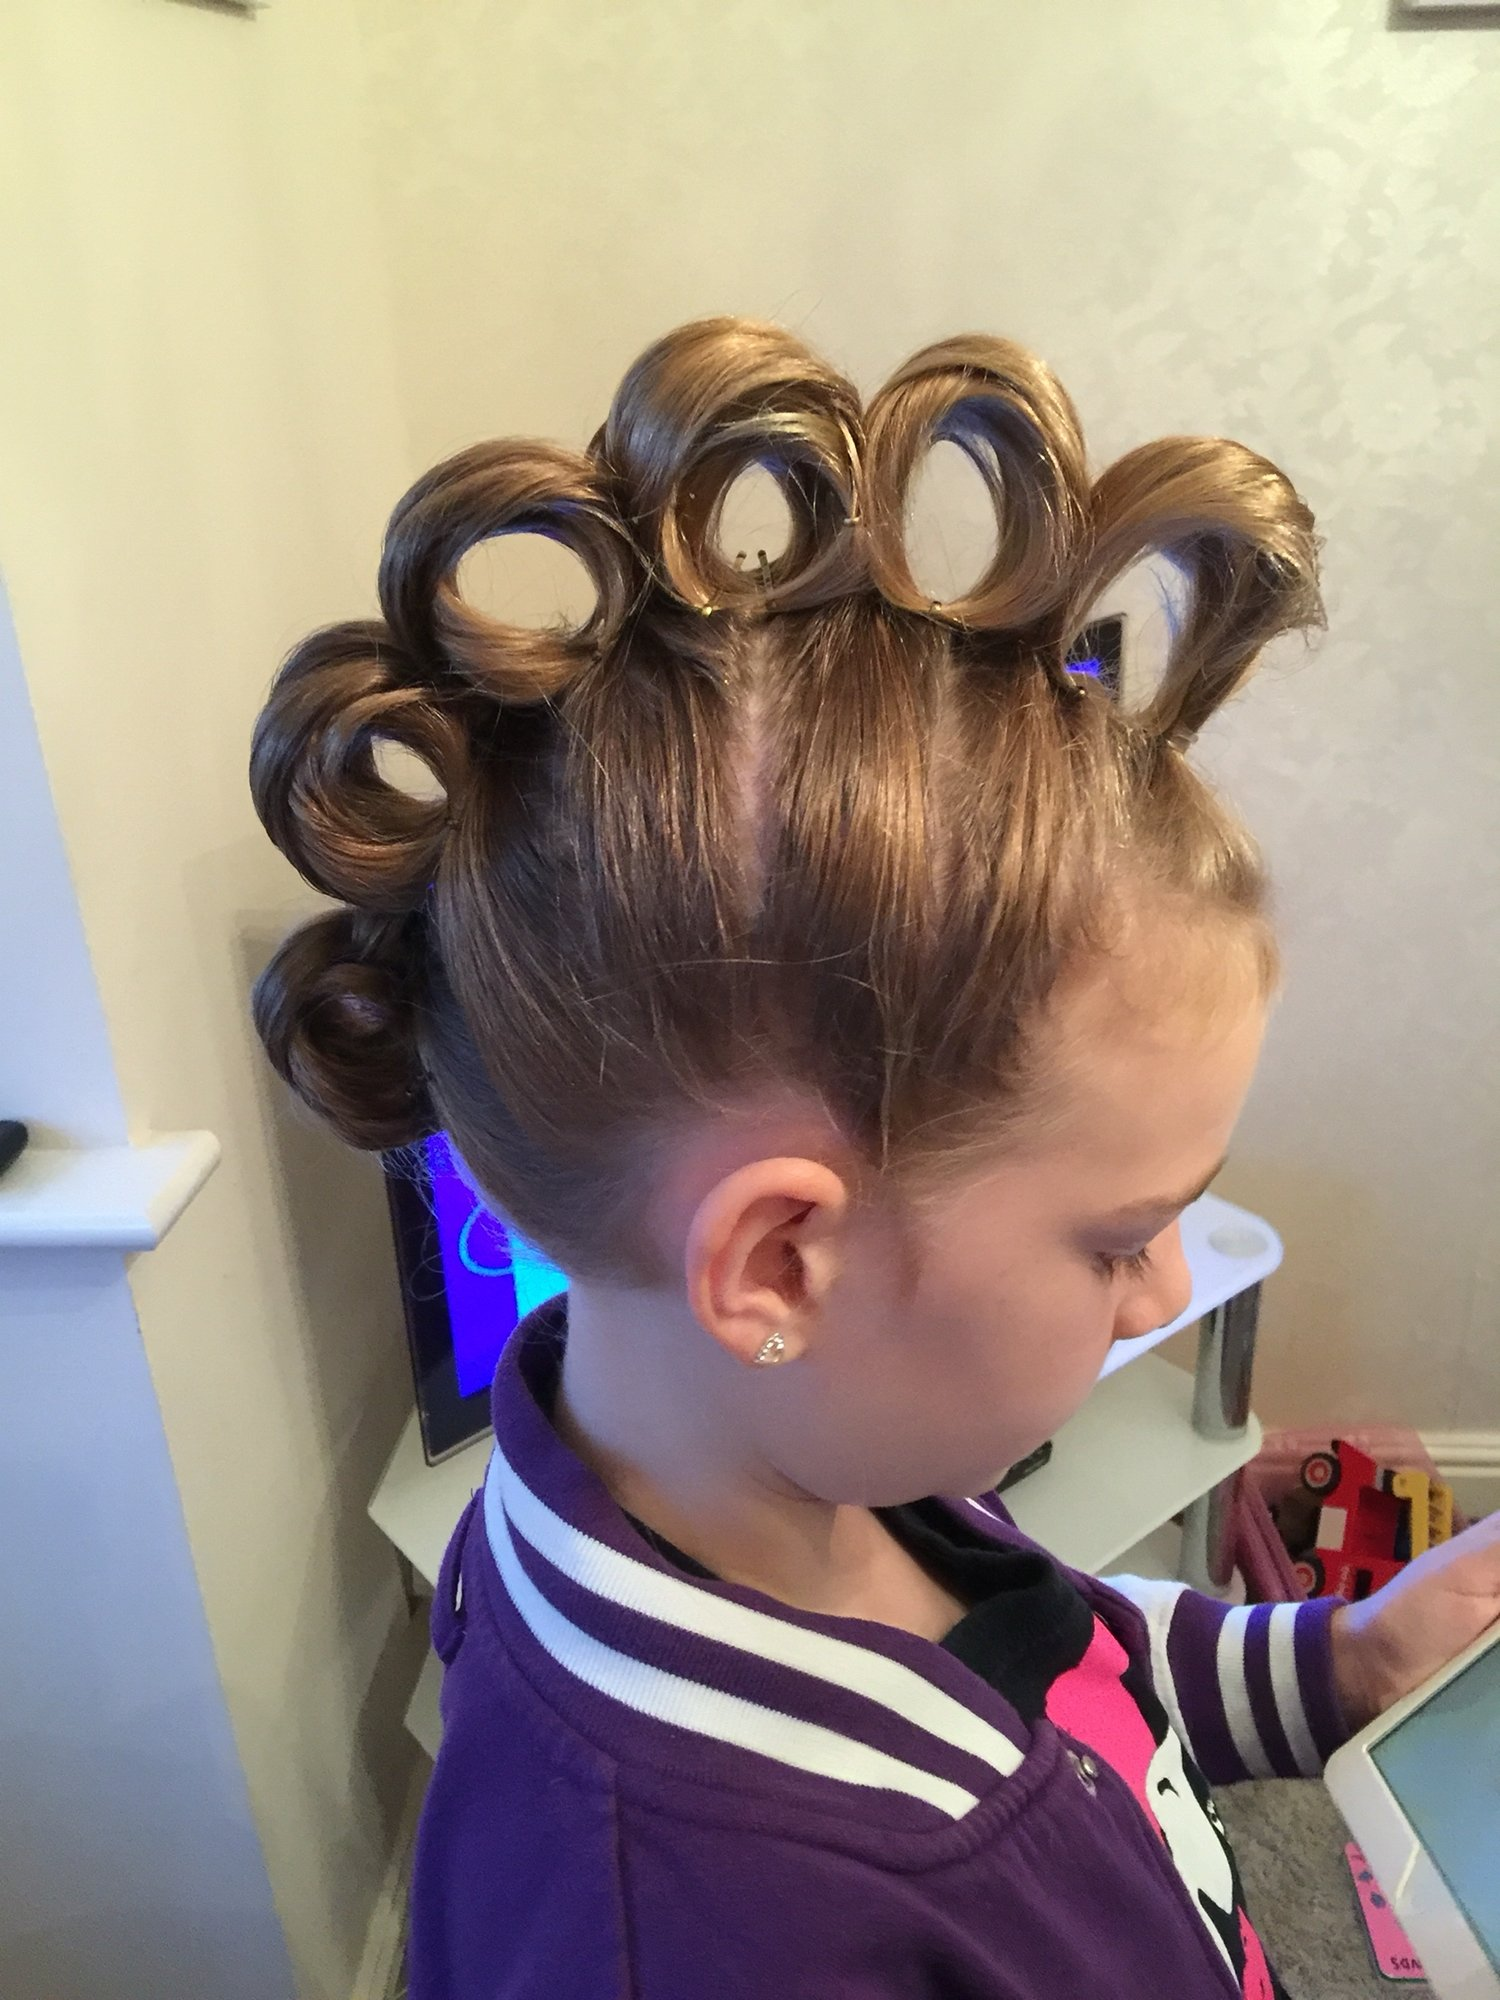 10 Elegant Crazy Hair Day Ideas For Long Hair rolling mohawk for crazy hair day hair pinterest crazy hair 2